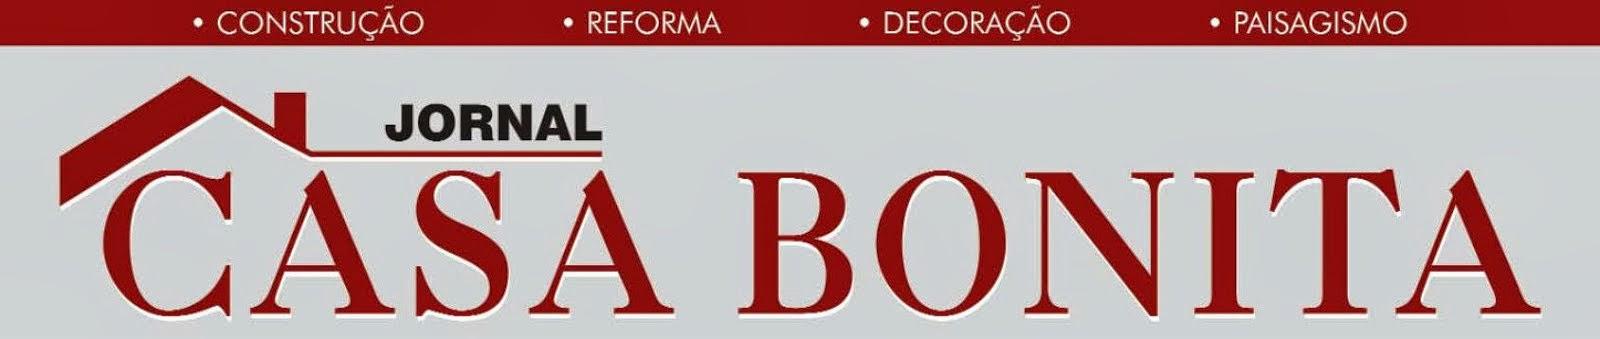 Jornal Casa Bonita